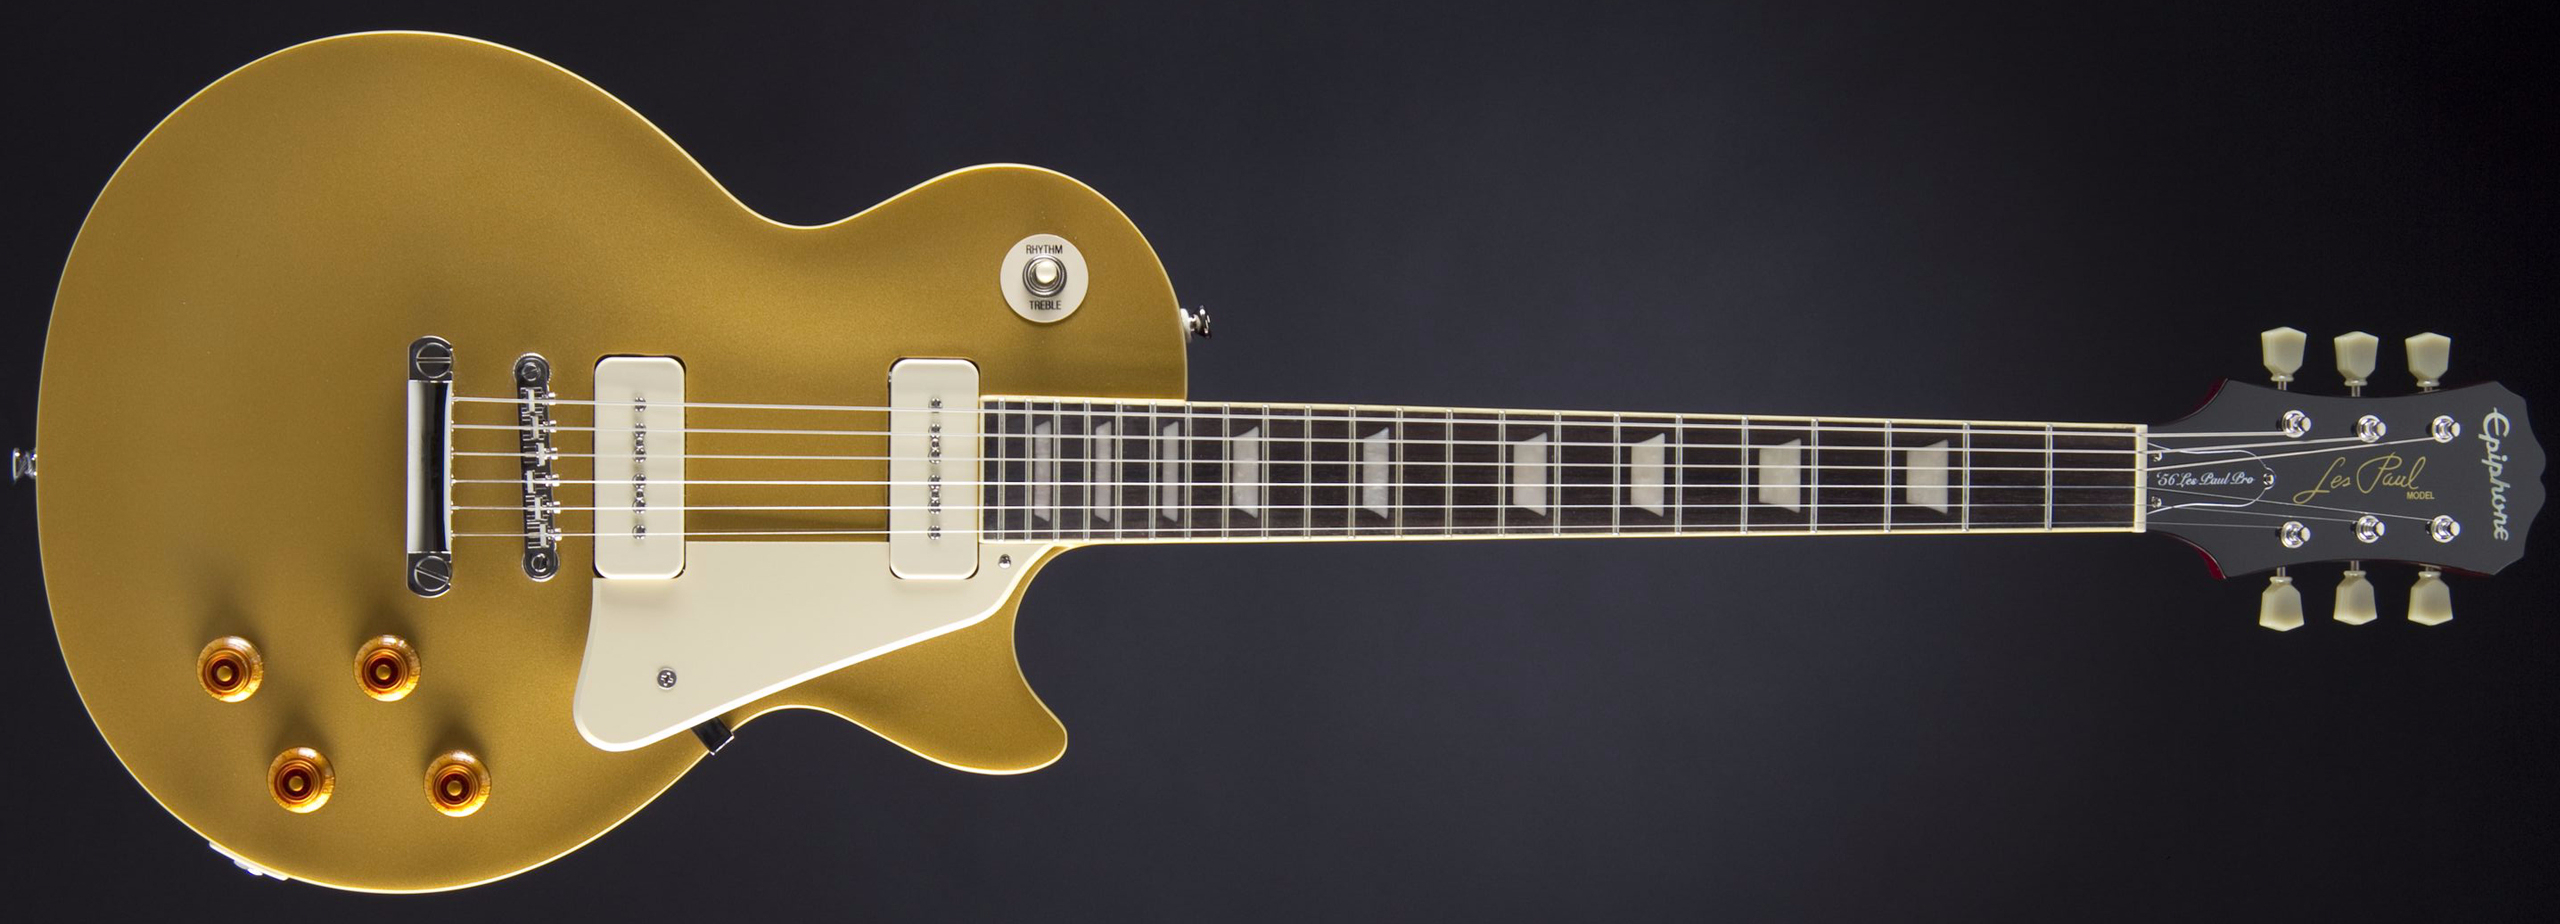 Epiphone 1956 Les Paul Standard Pro Metallic Goldtop